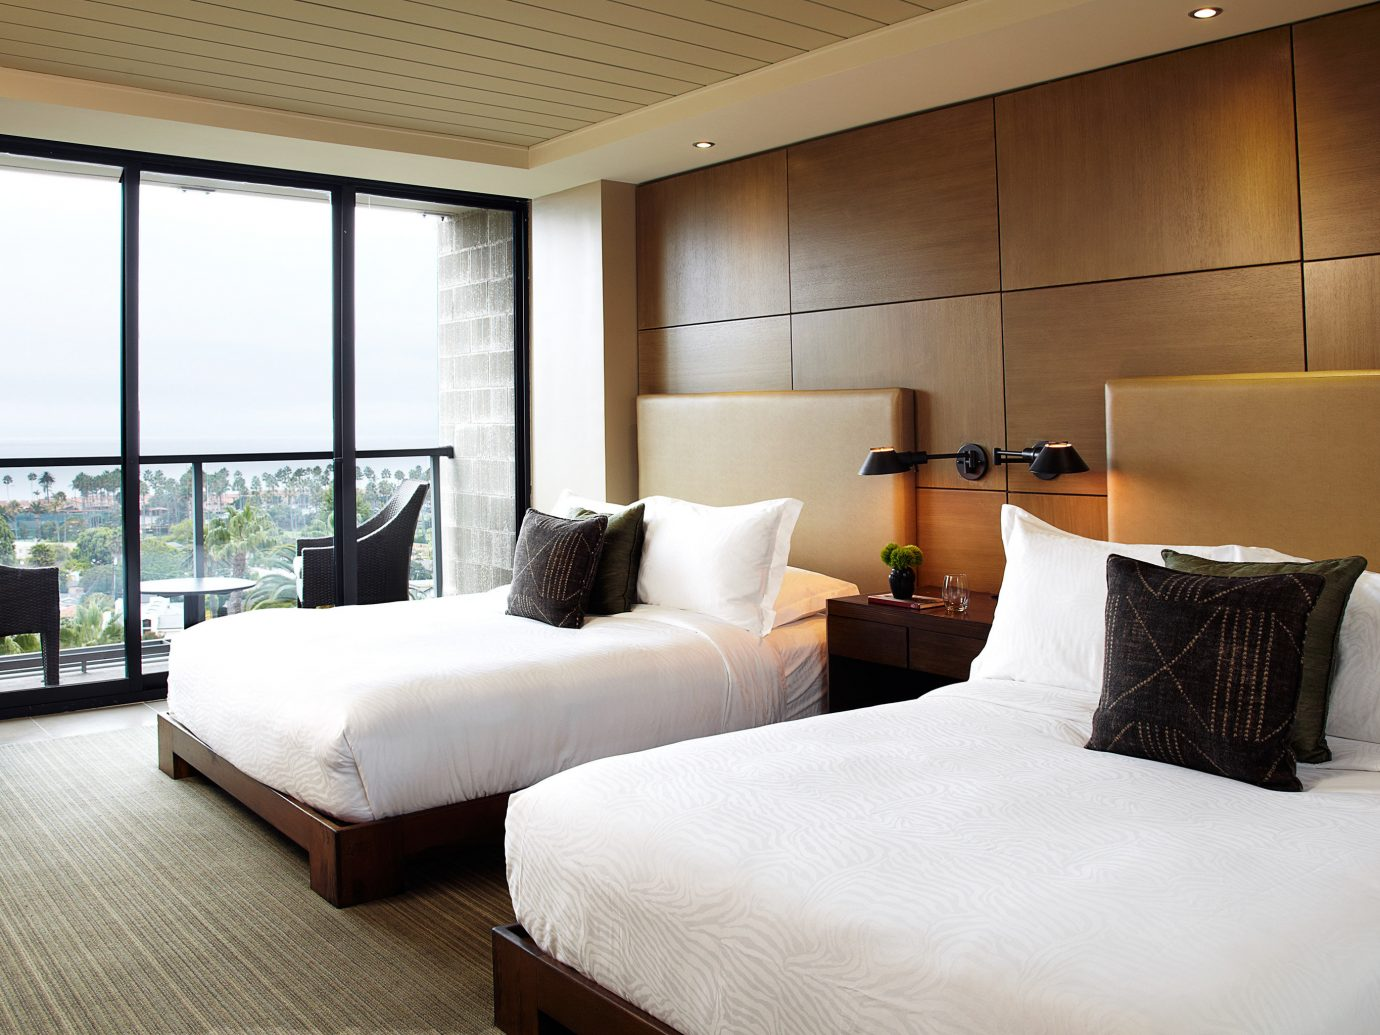 Bedroom at Hotel La Jolla in San Diego California